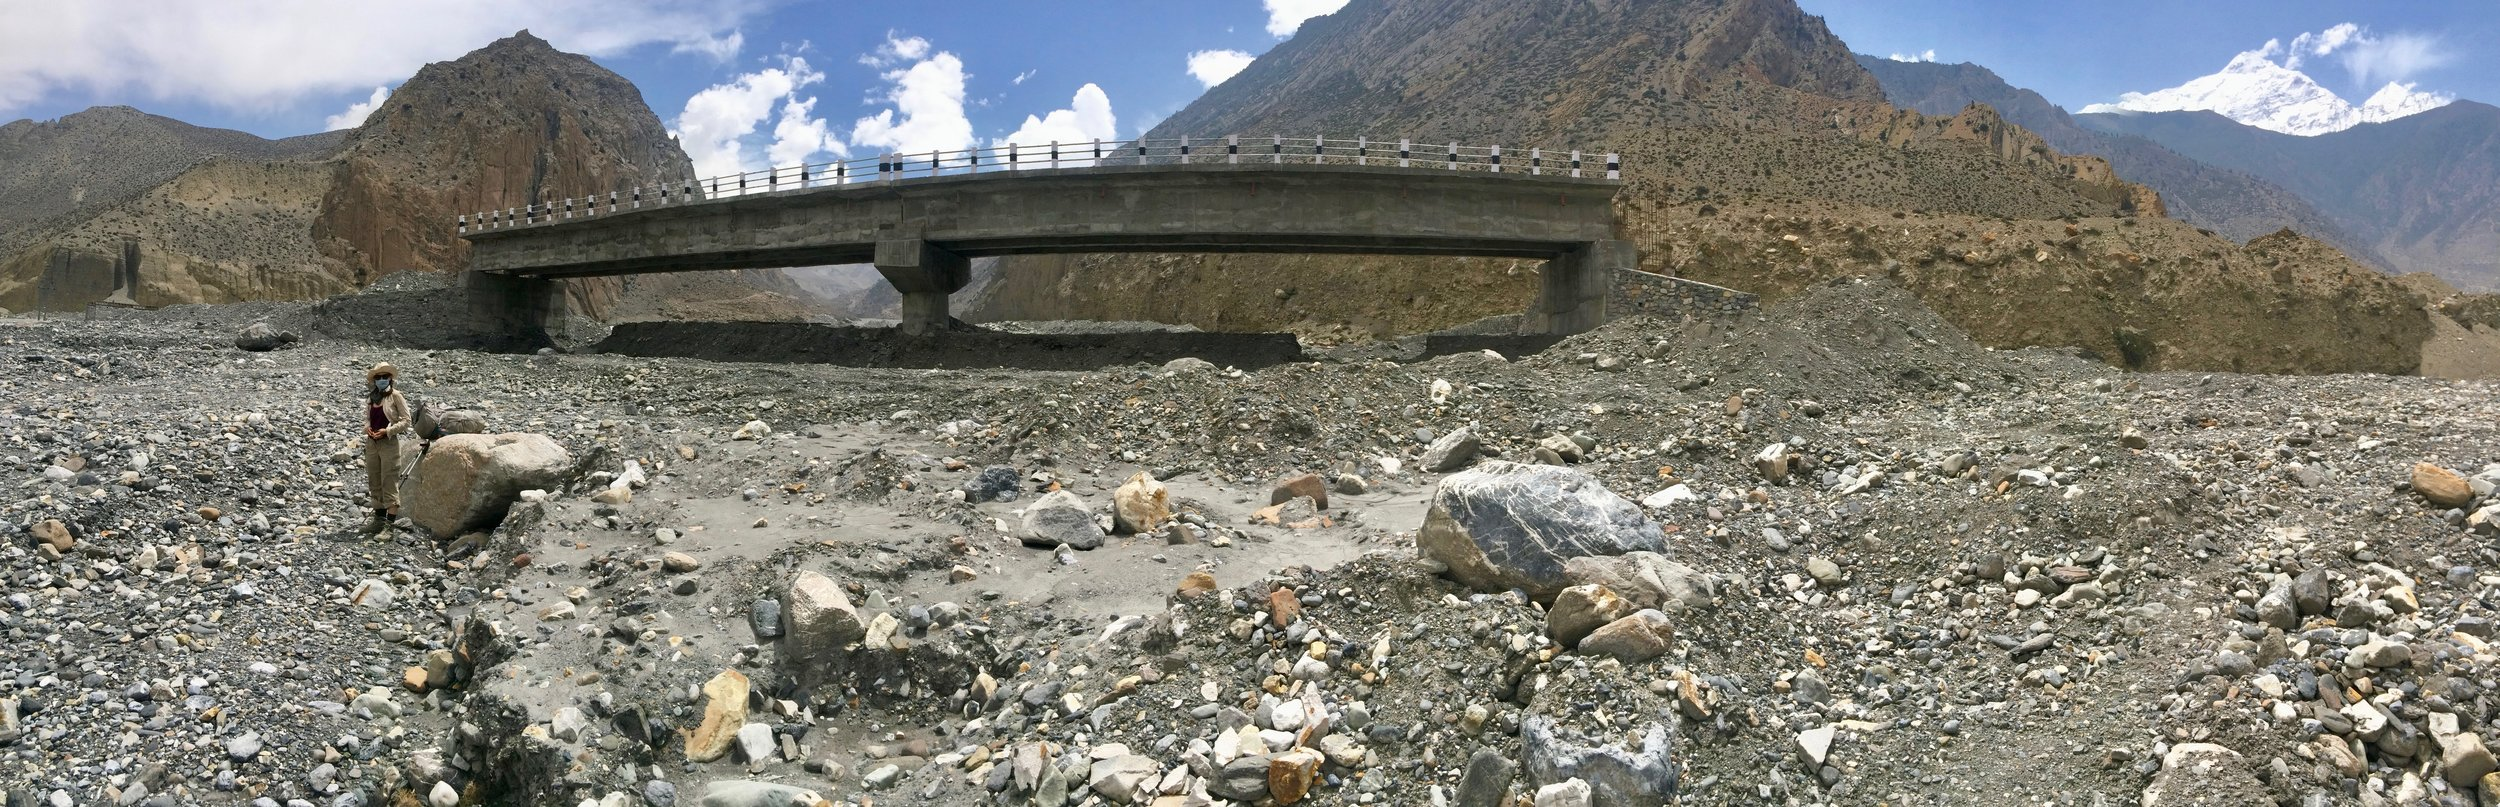 A futile attempt at building a bridge in the Kali Gandaki riverbed. The score: Nature = 1, Man = 0